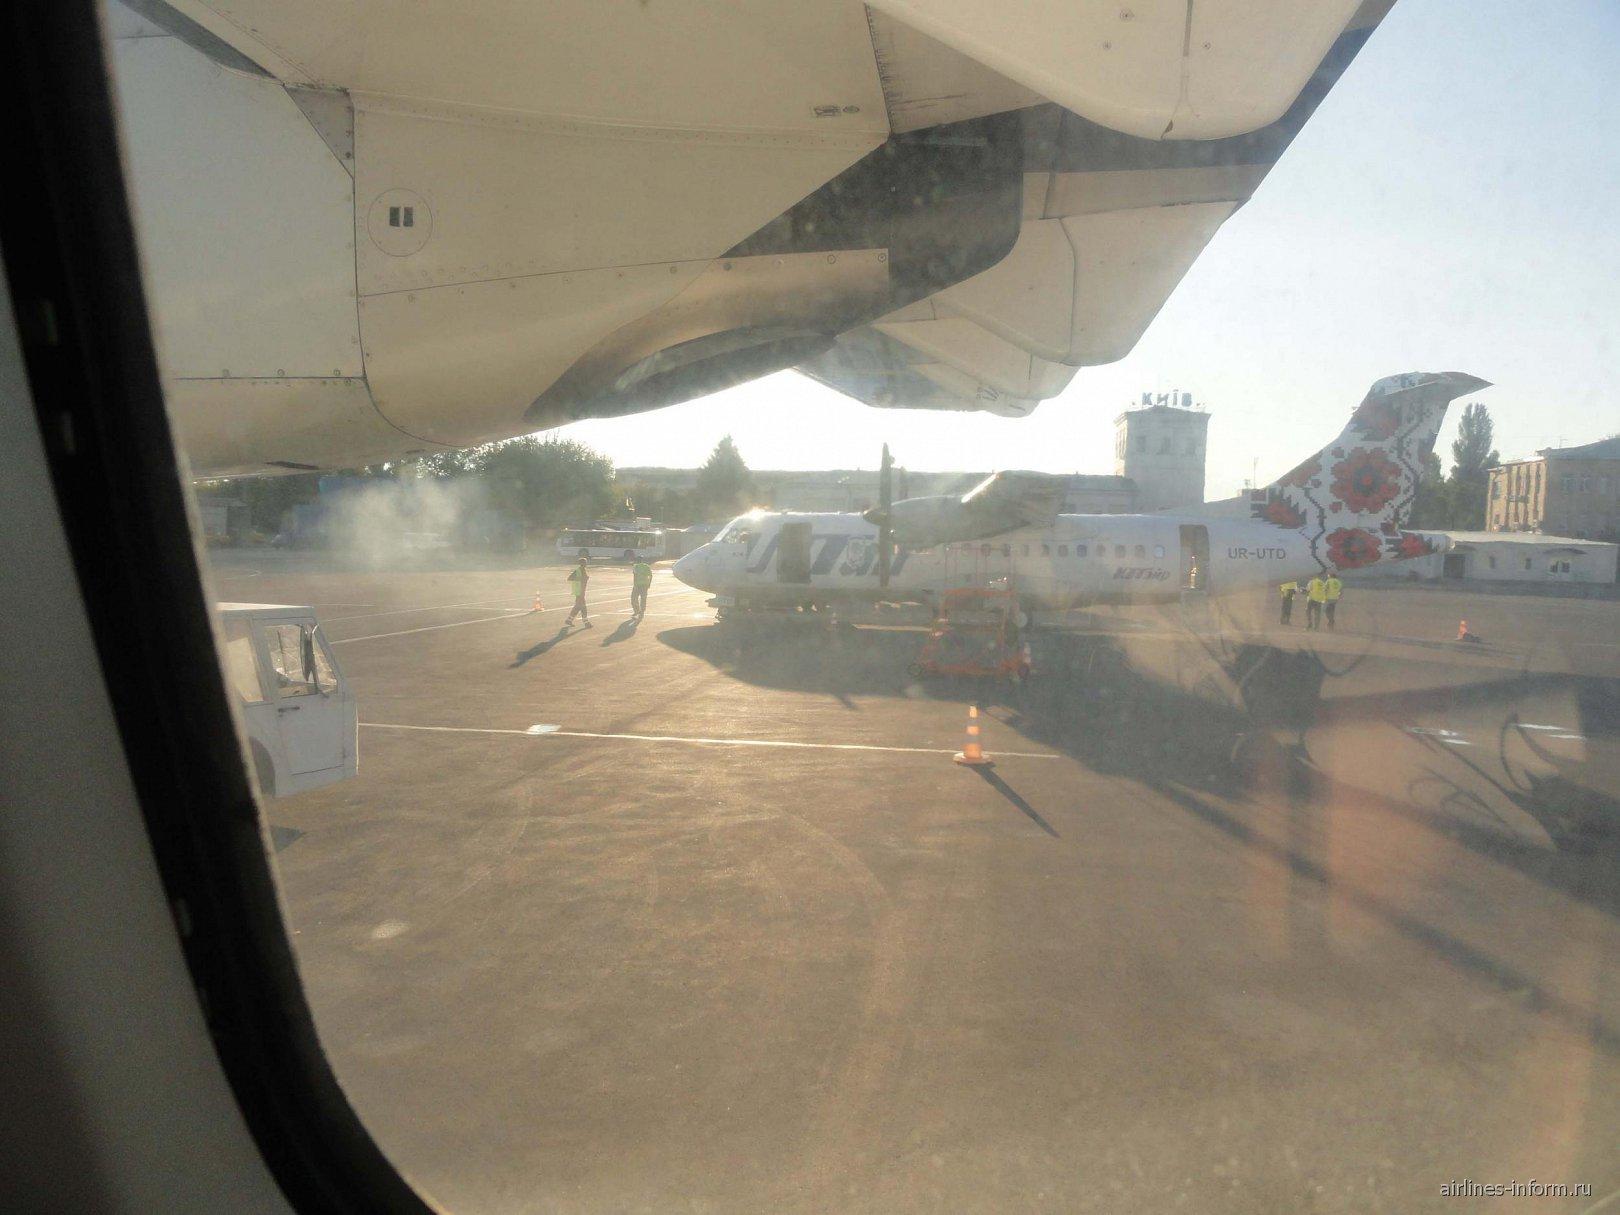 ATR 42 авиакомпании UTair Ukraine в аэропорту Киев Жуляны